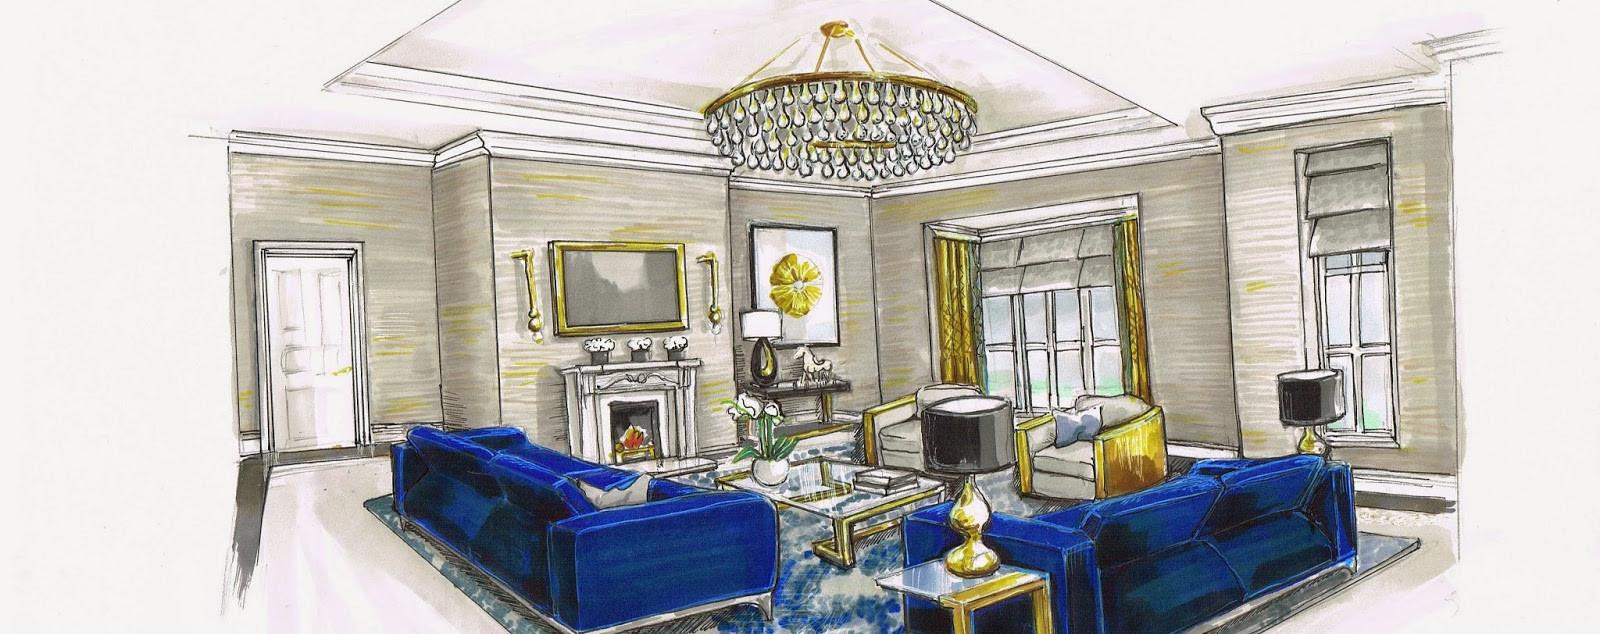 lounge interior sketch.JPG